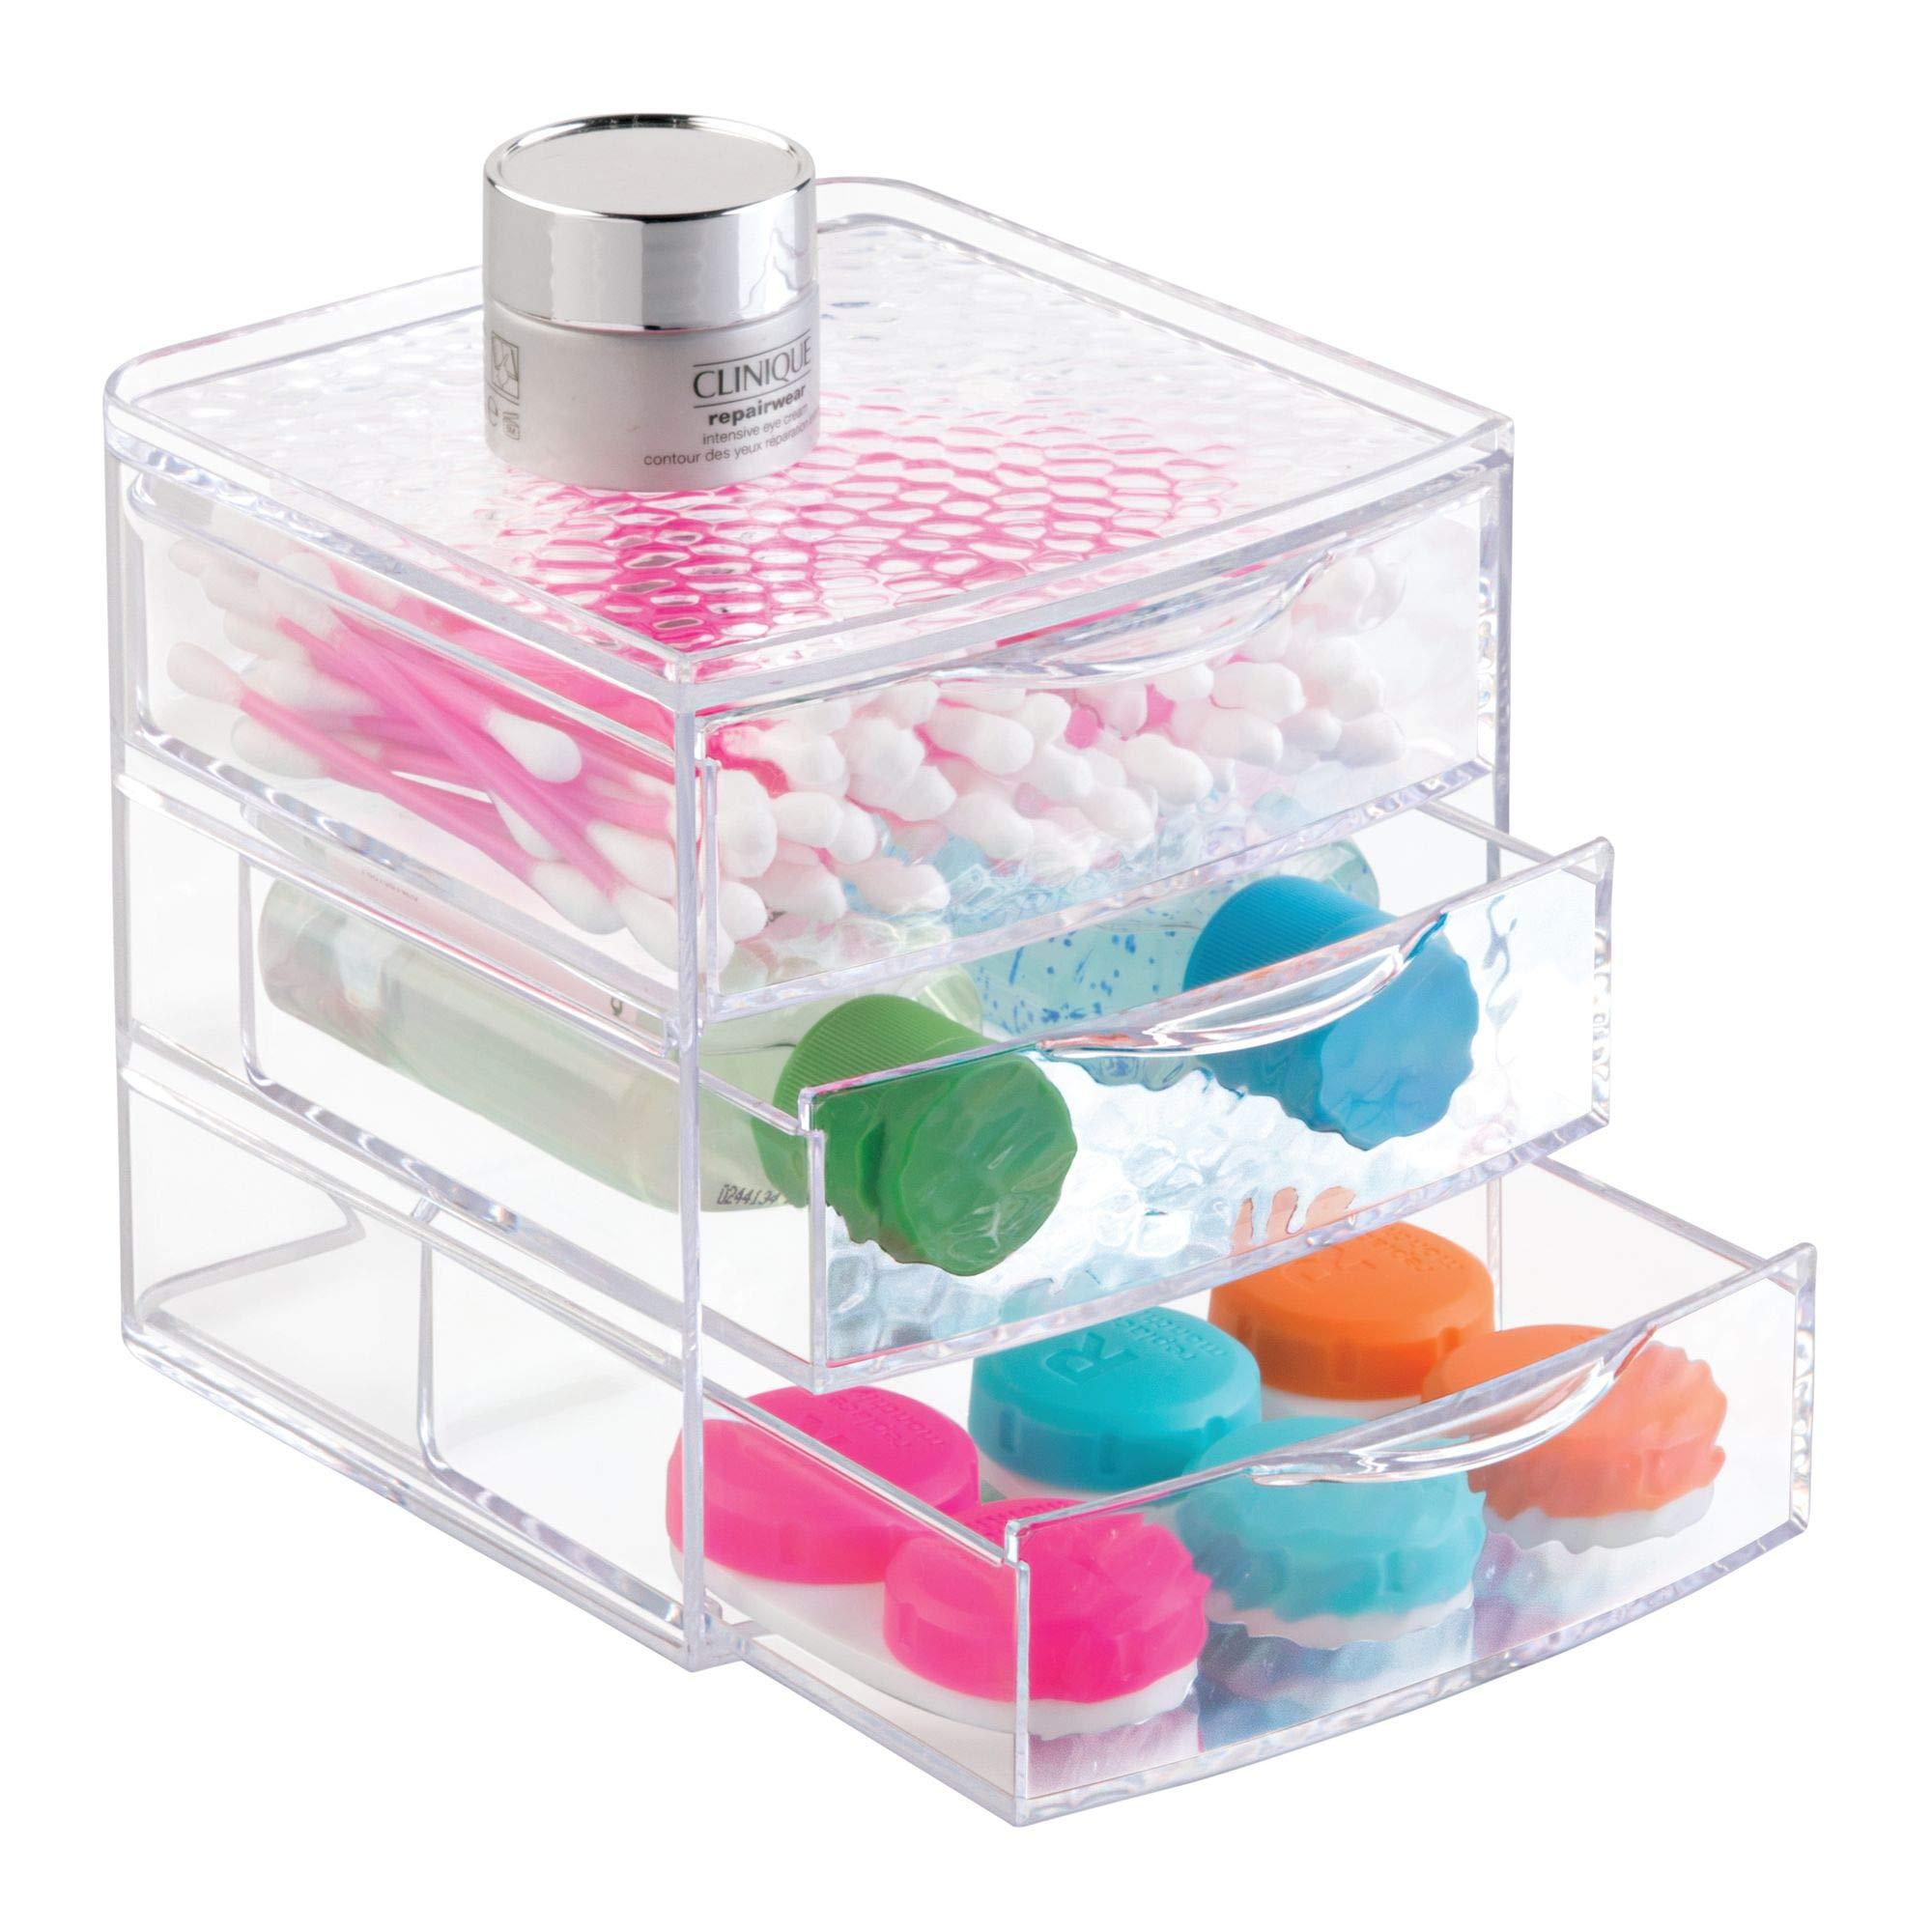 "iDesign Rain Plastic 3-Drawer Jewelry Box, Compact Storage Organization Drawers Set for Cosmetics, Dental Supplies, Hair Care, Bathroom, Office, Dorm, Desk, Countertop, 4.5"" x 4.5"" x 5.4"", Clear"